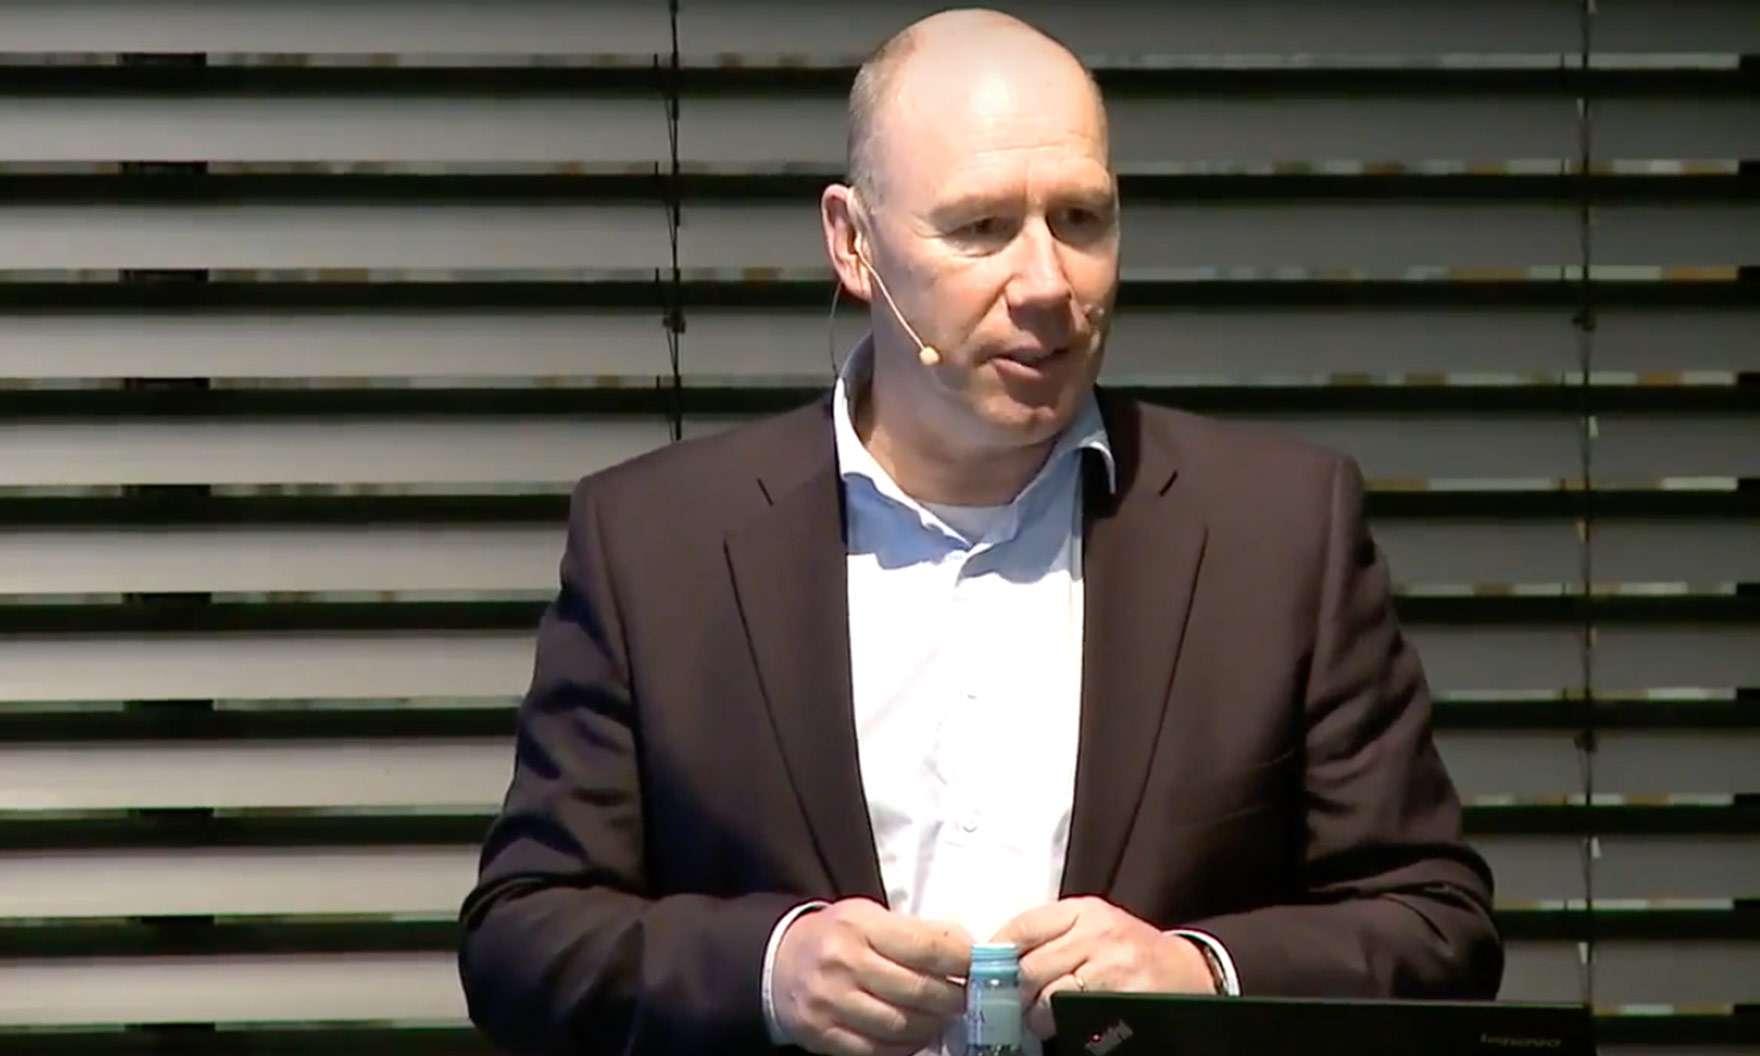 Book Launch video: Service Design for Business, Oslo 1/3